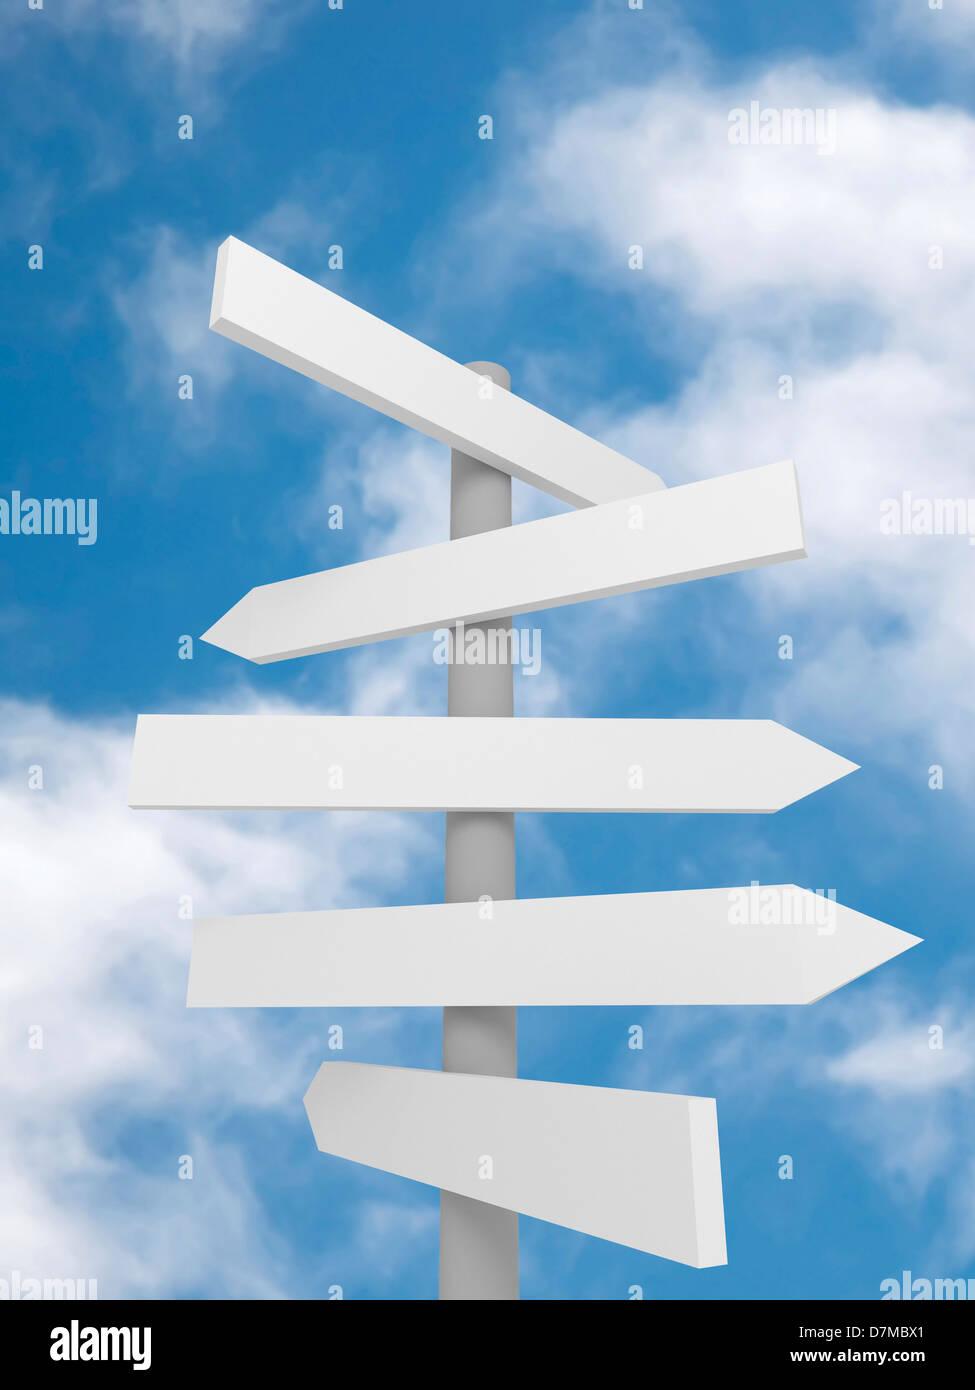 Signpost, artwork - Stock Image